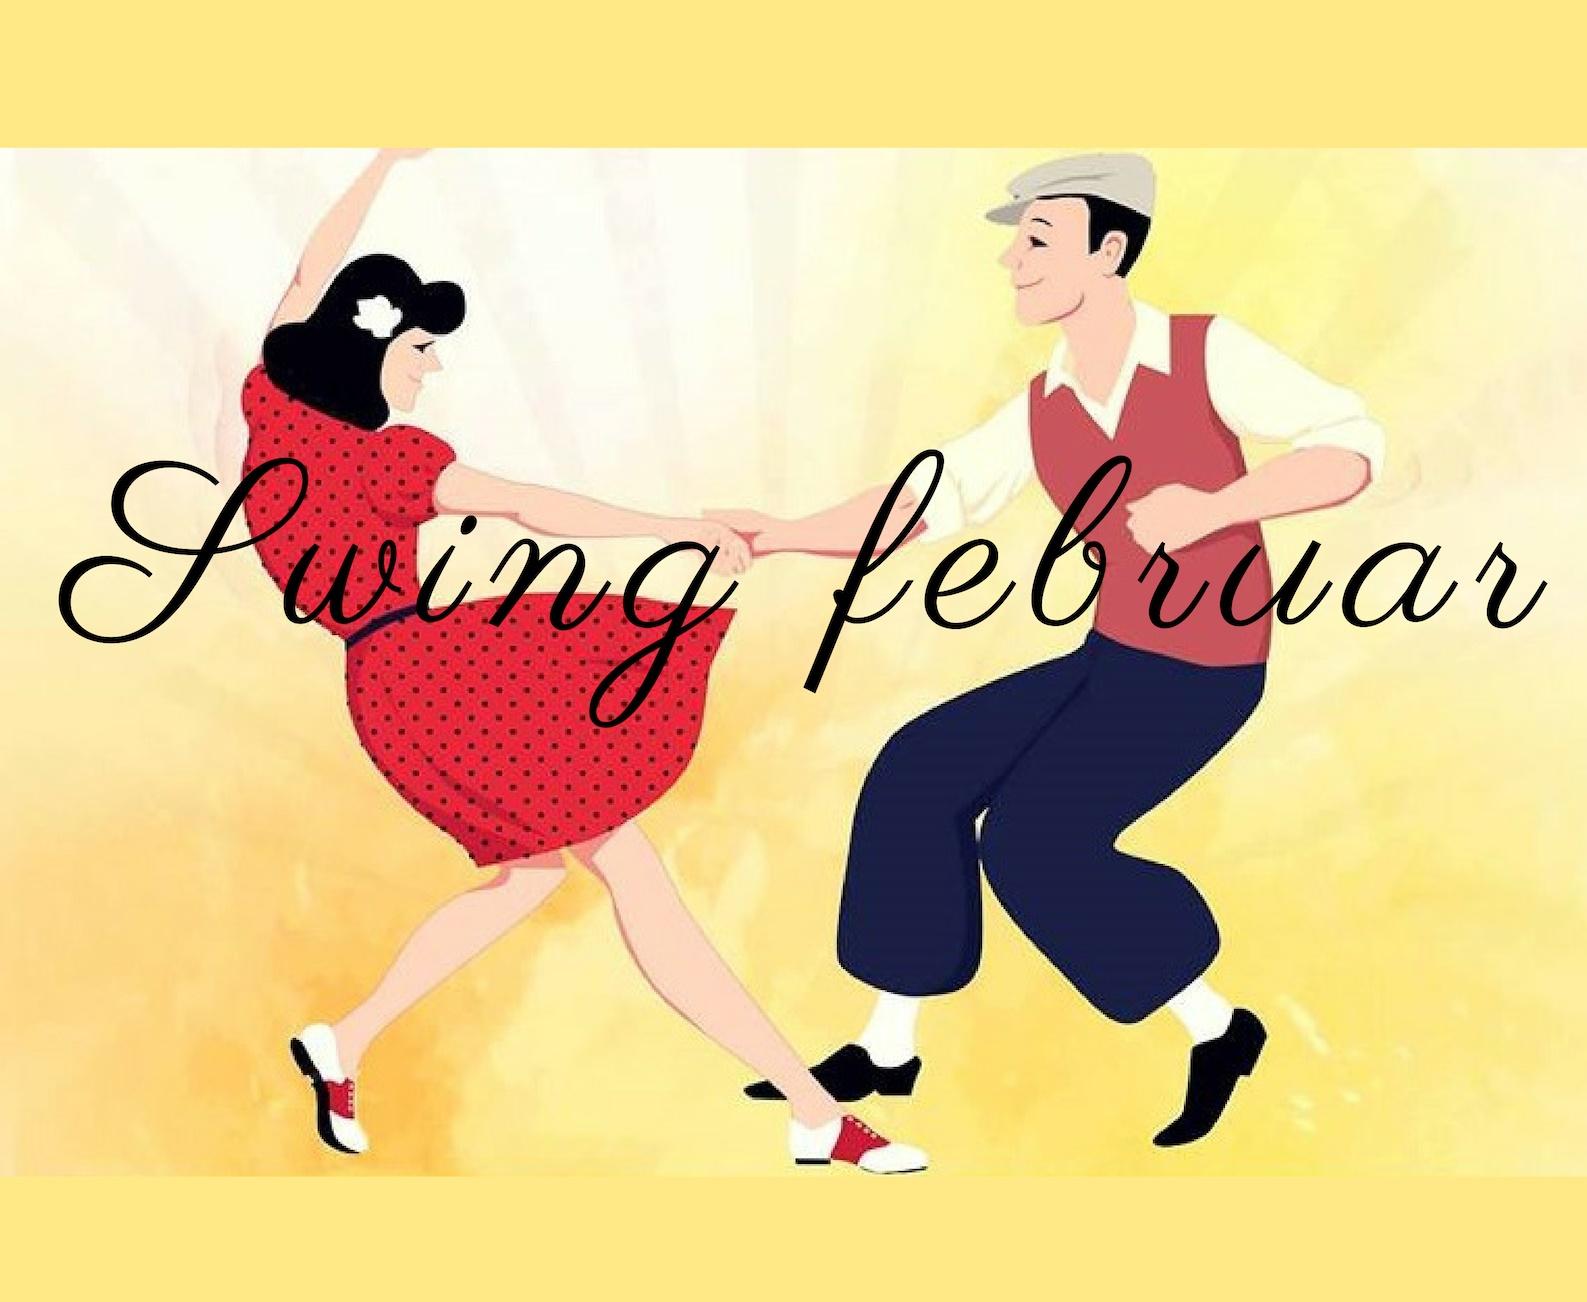 Swing februar